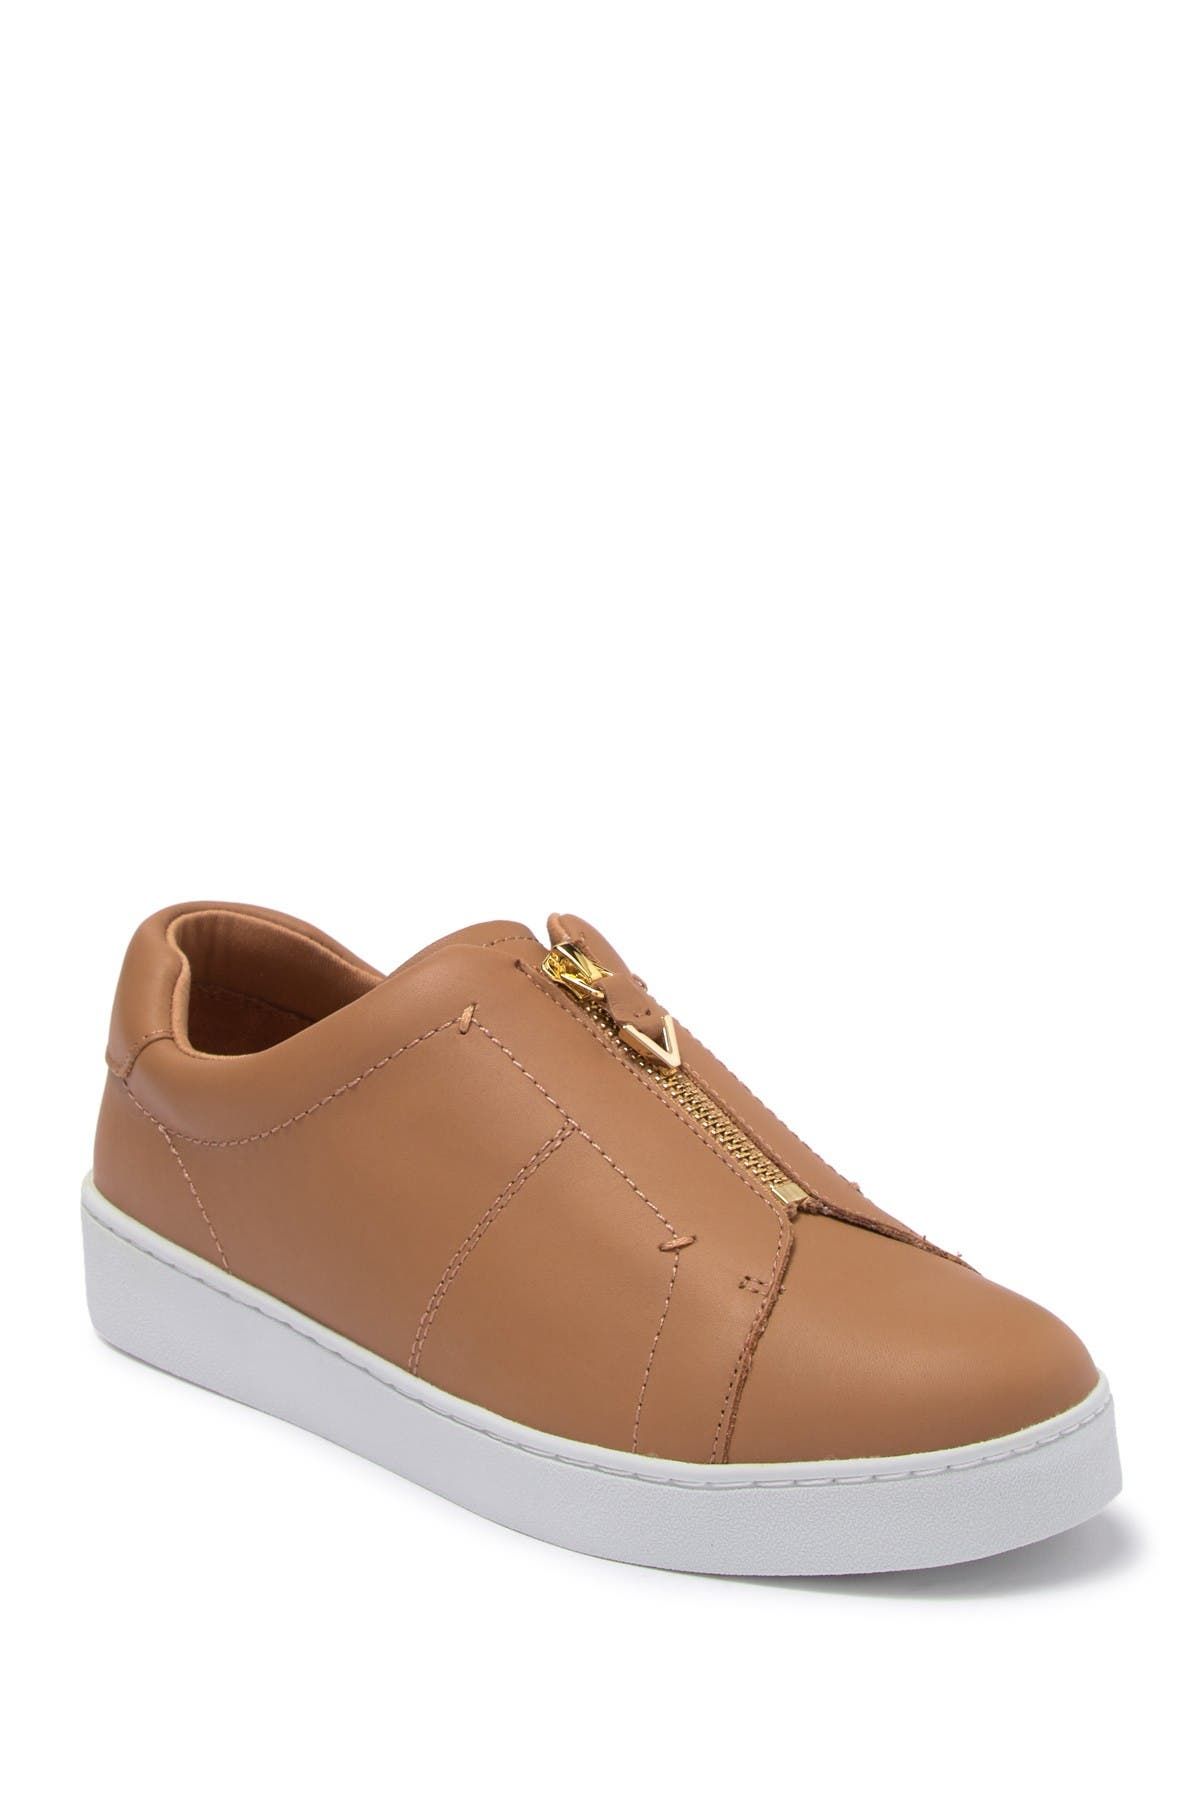 Vionic   Ellis Slip-On Sneaker